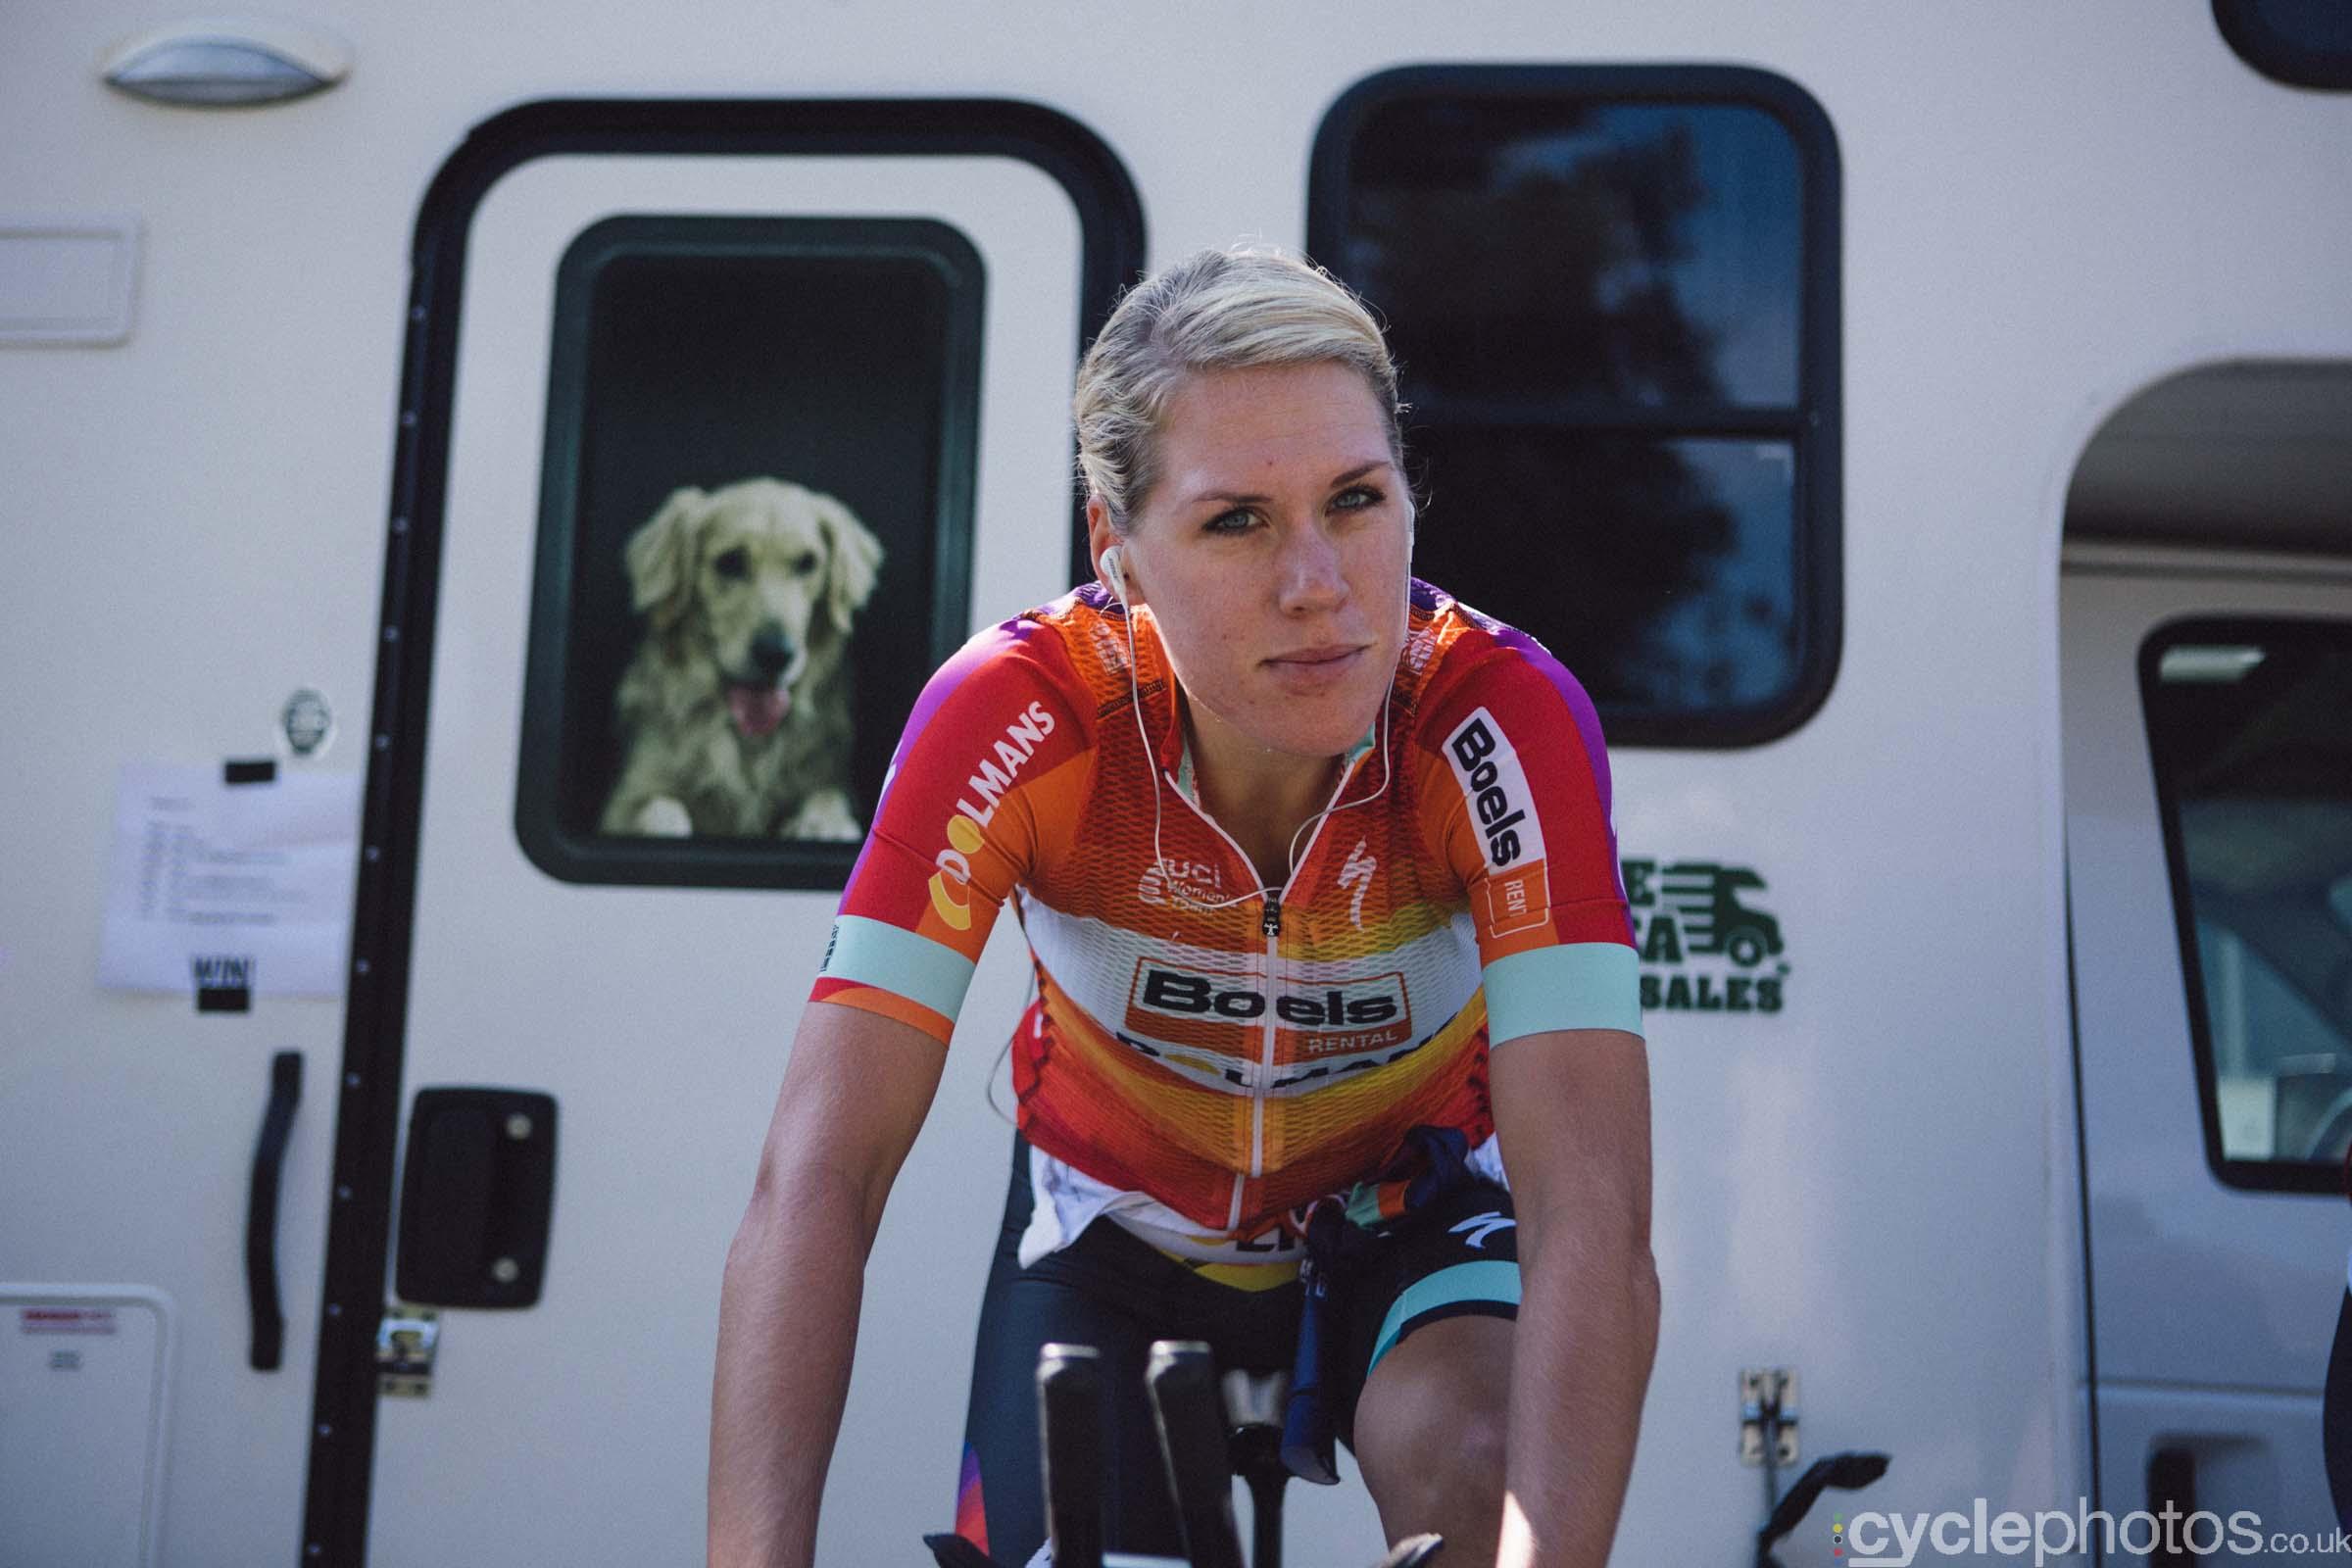 cyclephotos-world-champs-richmond-155530-ellen-van-dijk